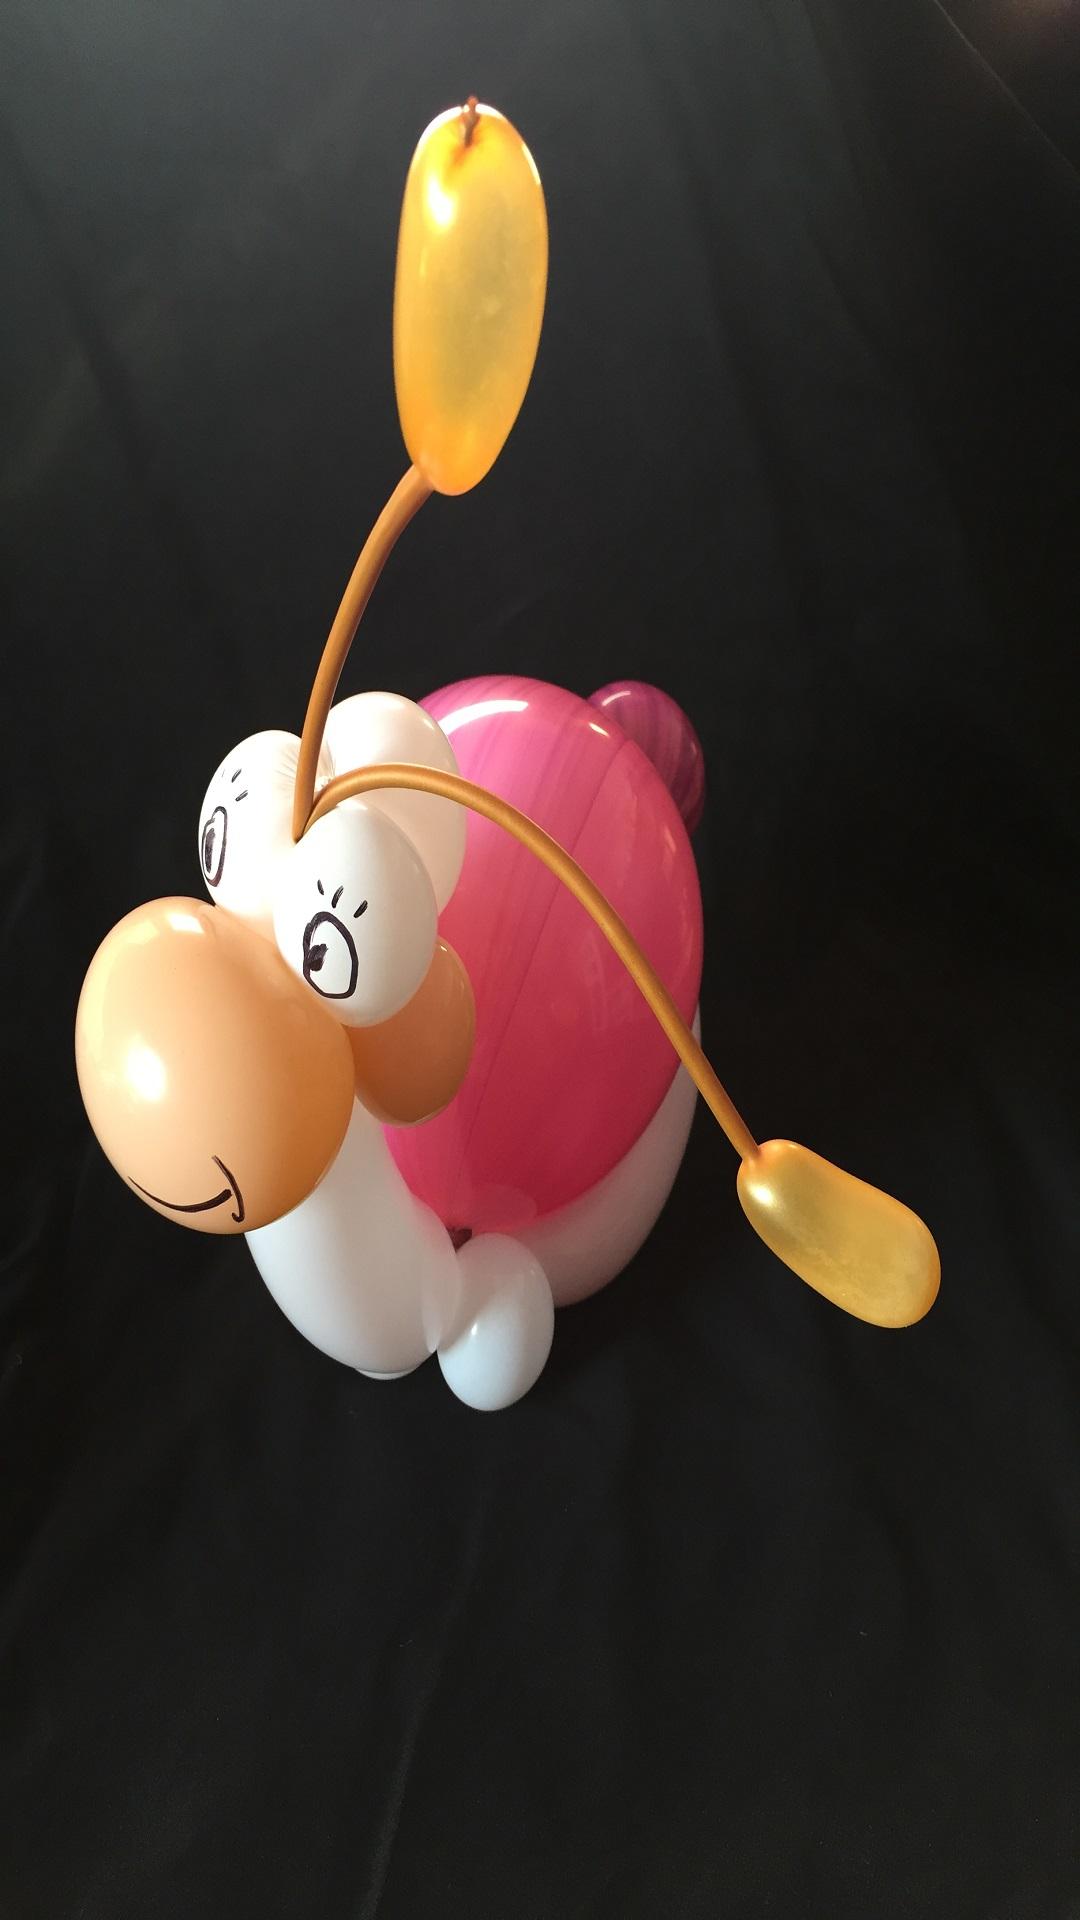 Petit Escargot en sculpture de ballon cirkonflex